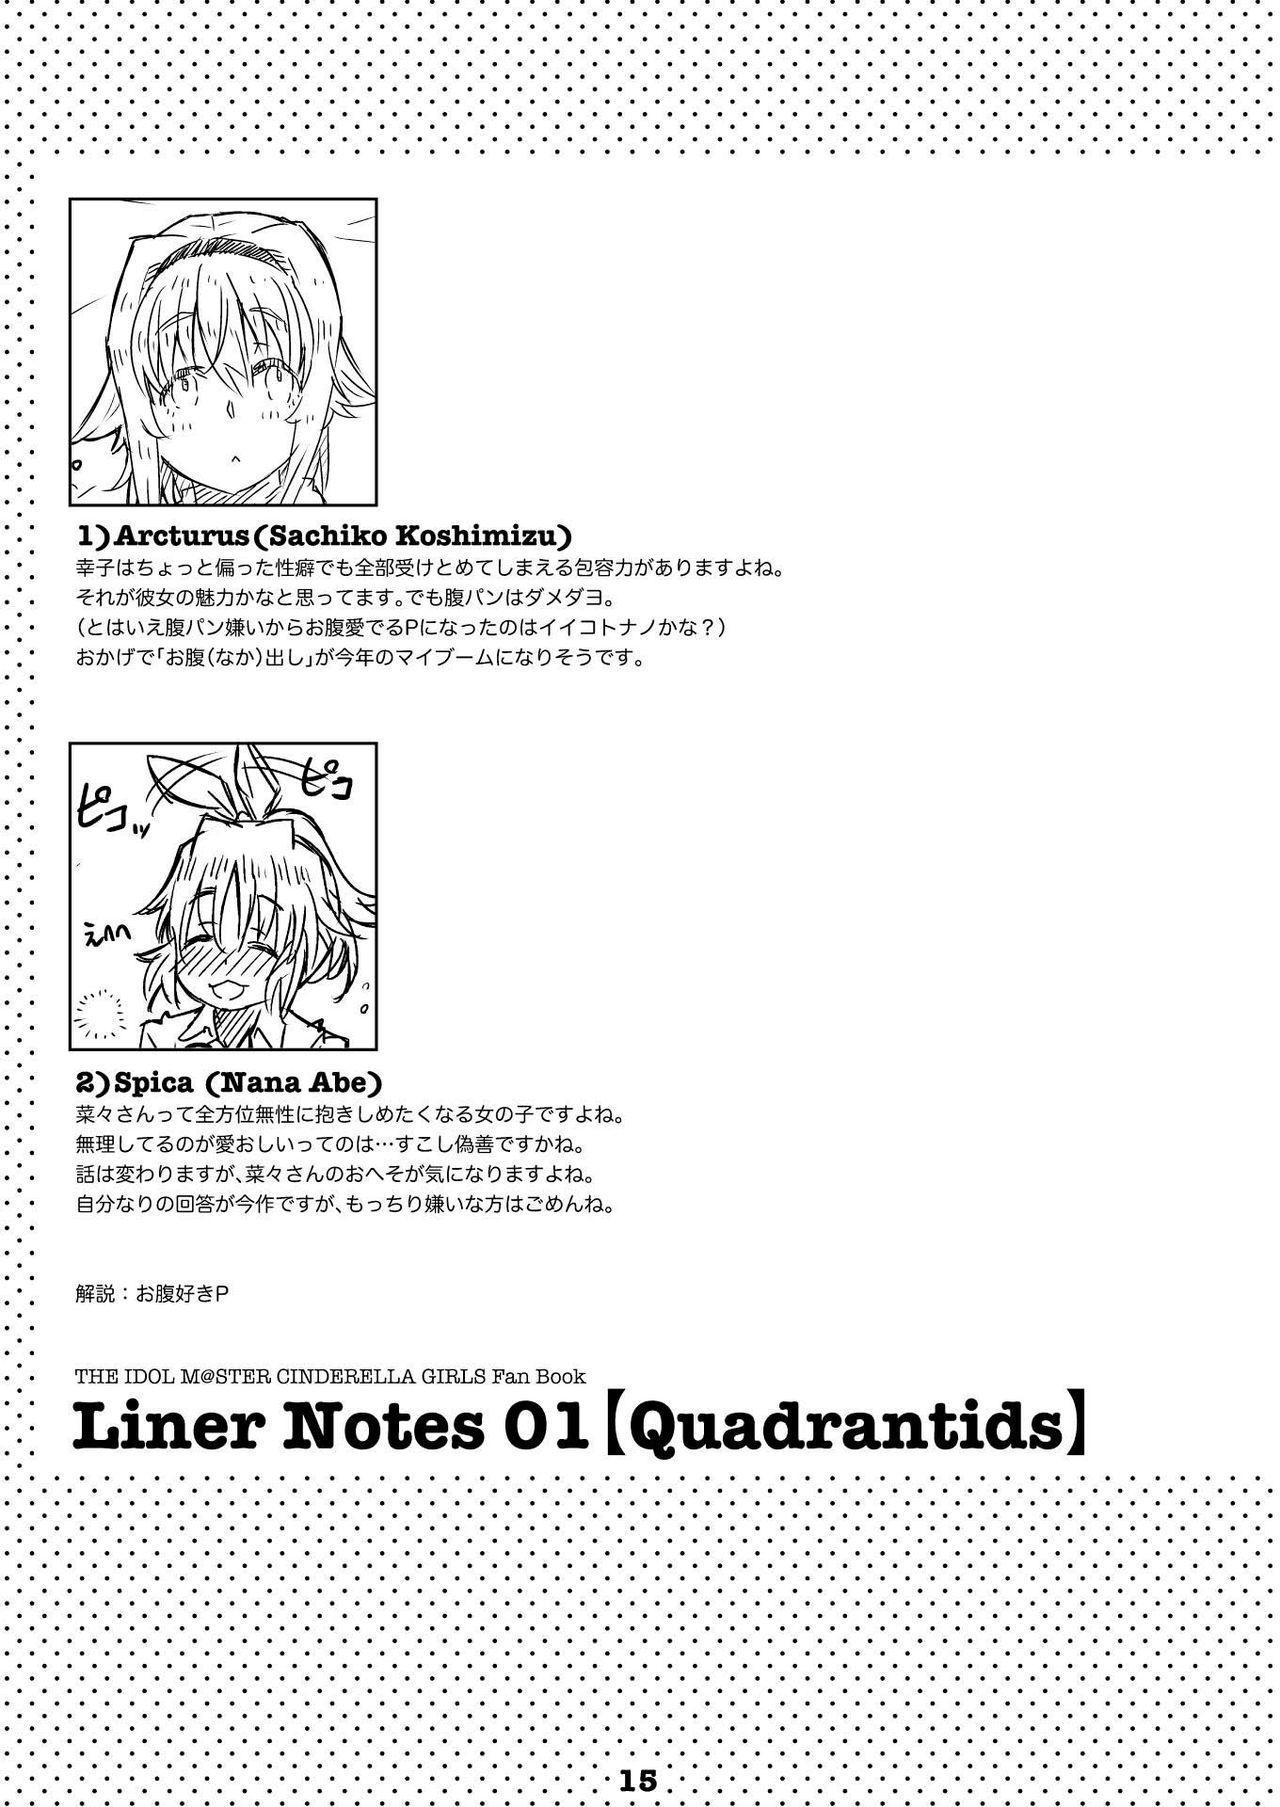 Liner Notes 01 13